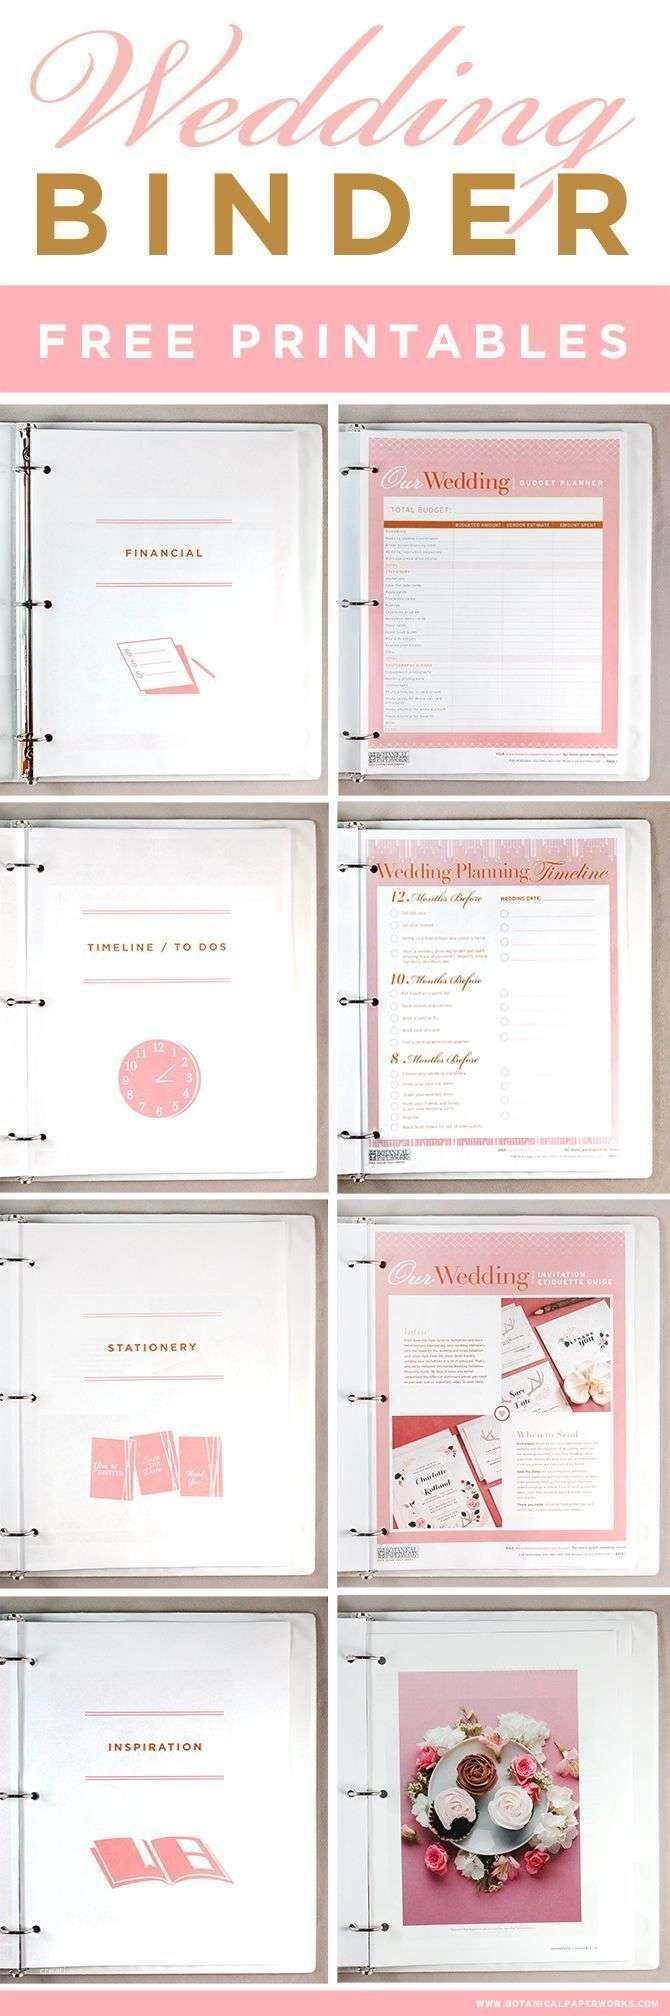 wedding budget checklist pdf new wedding budget checklist pdf